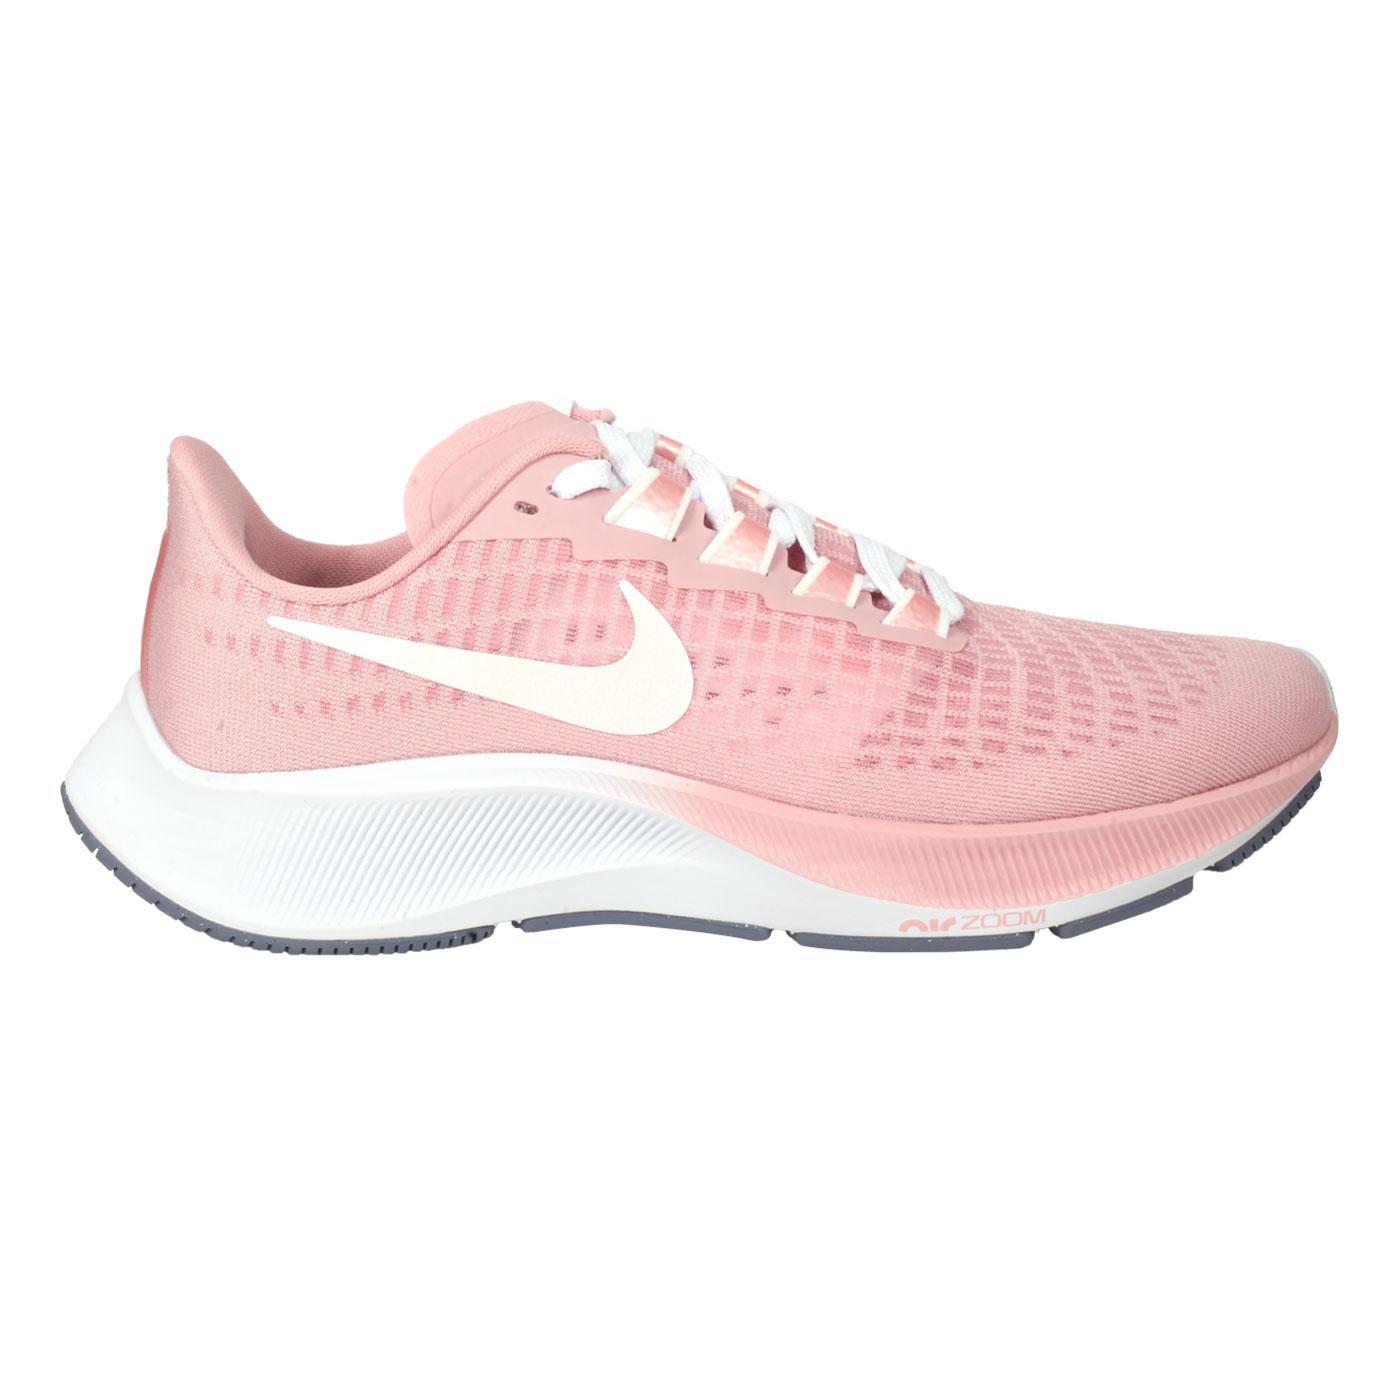 NIKE 女款慢跑鞋  @WMNS AIR ZOOM PEGASUS 37@DH0129600